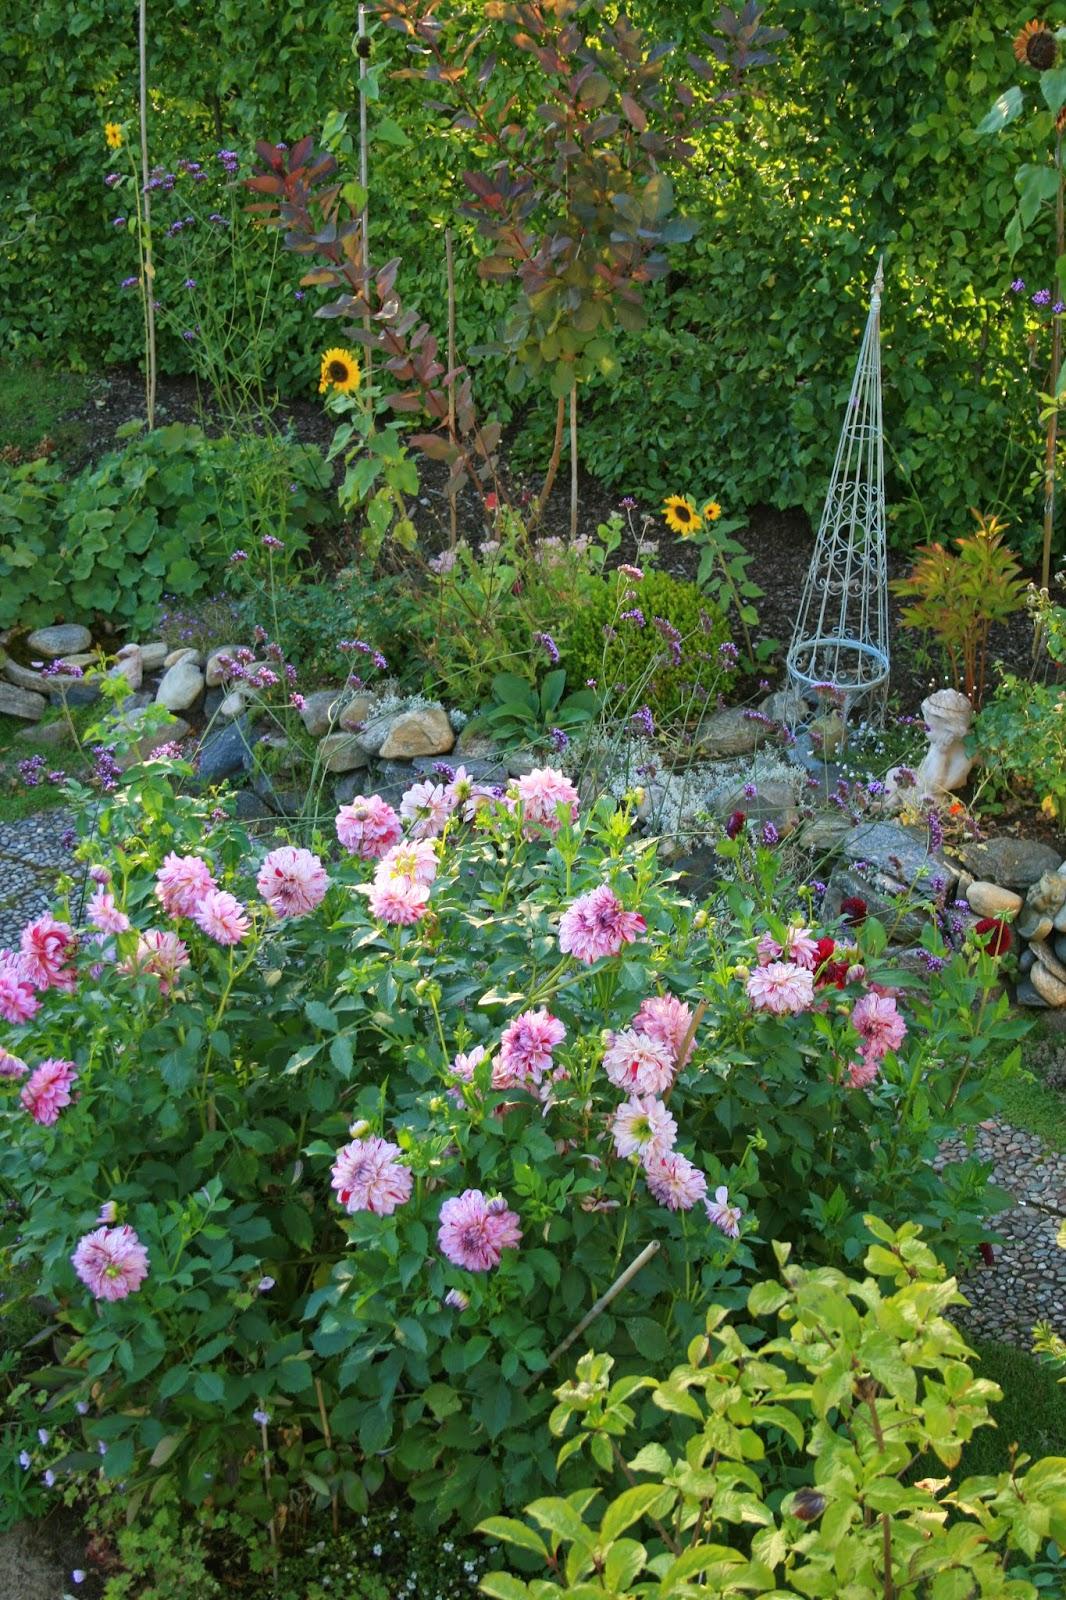 ekologiskt trädgårdsarbete